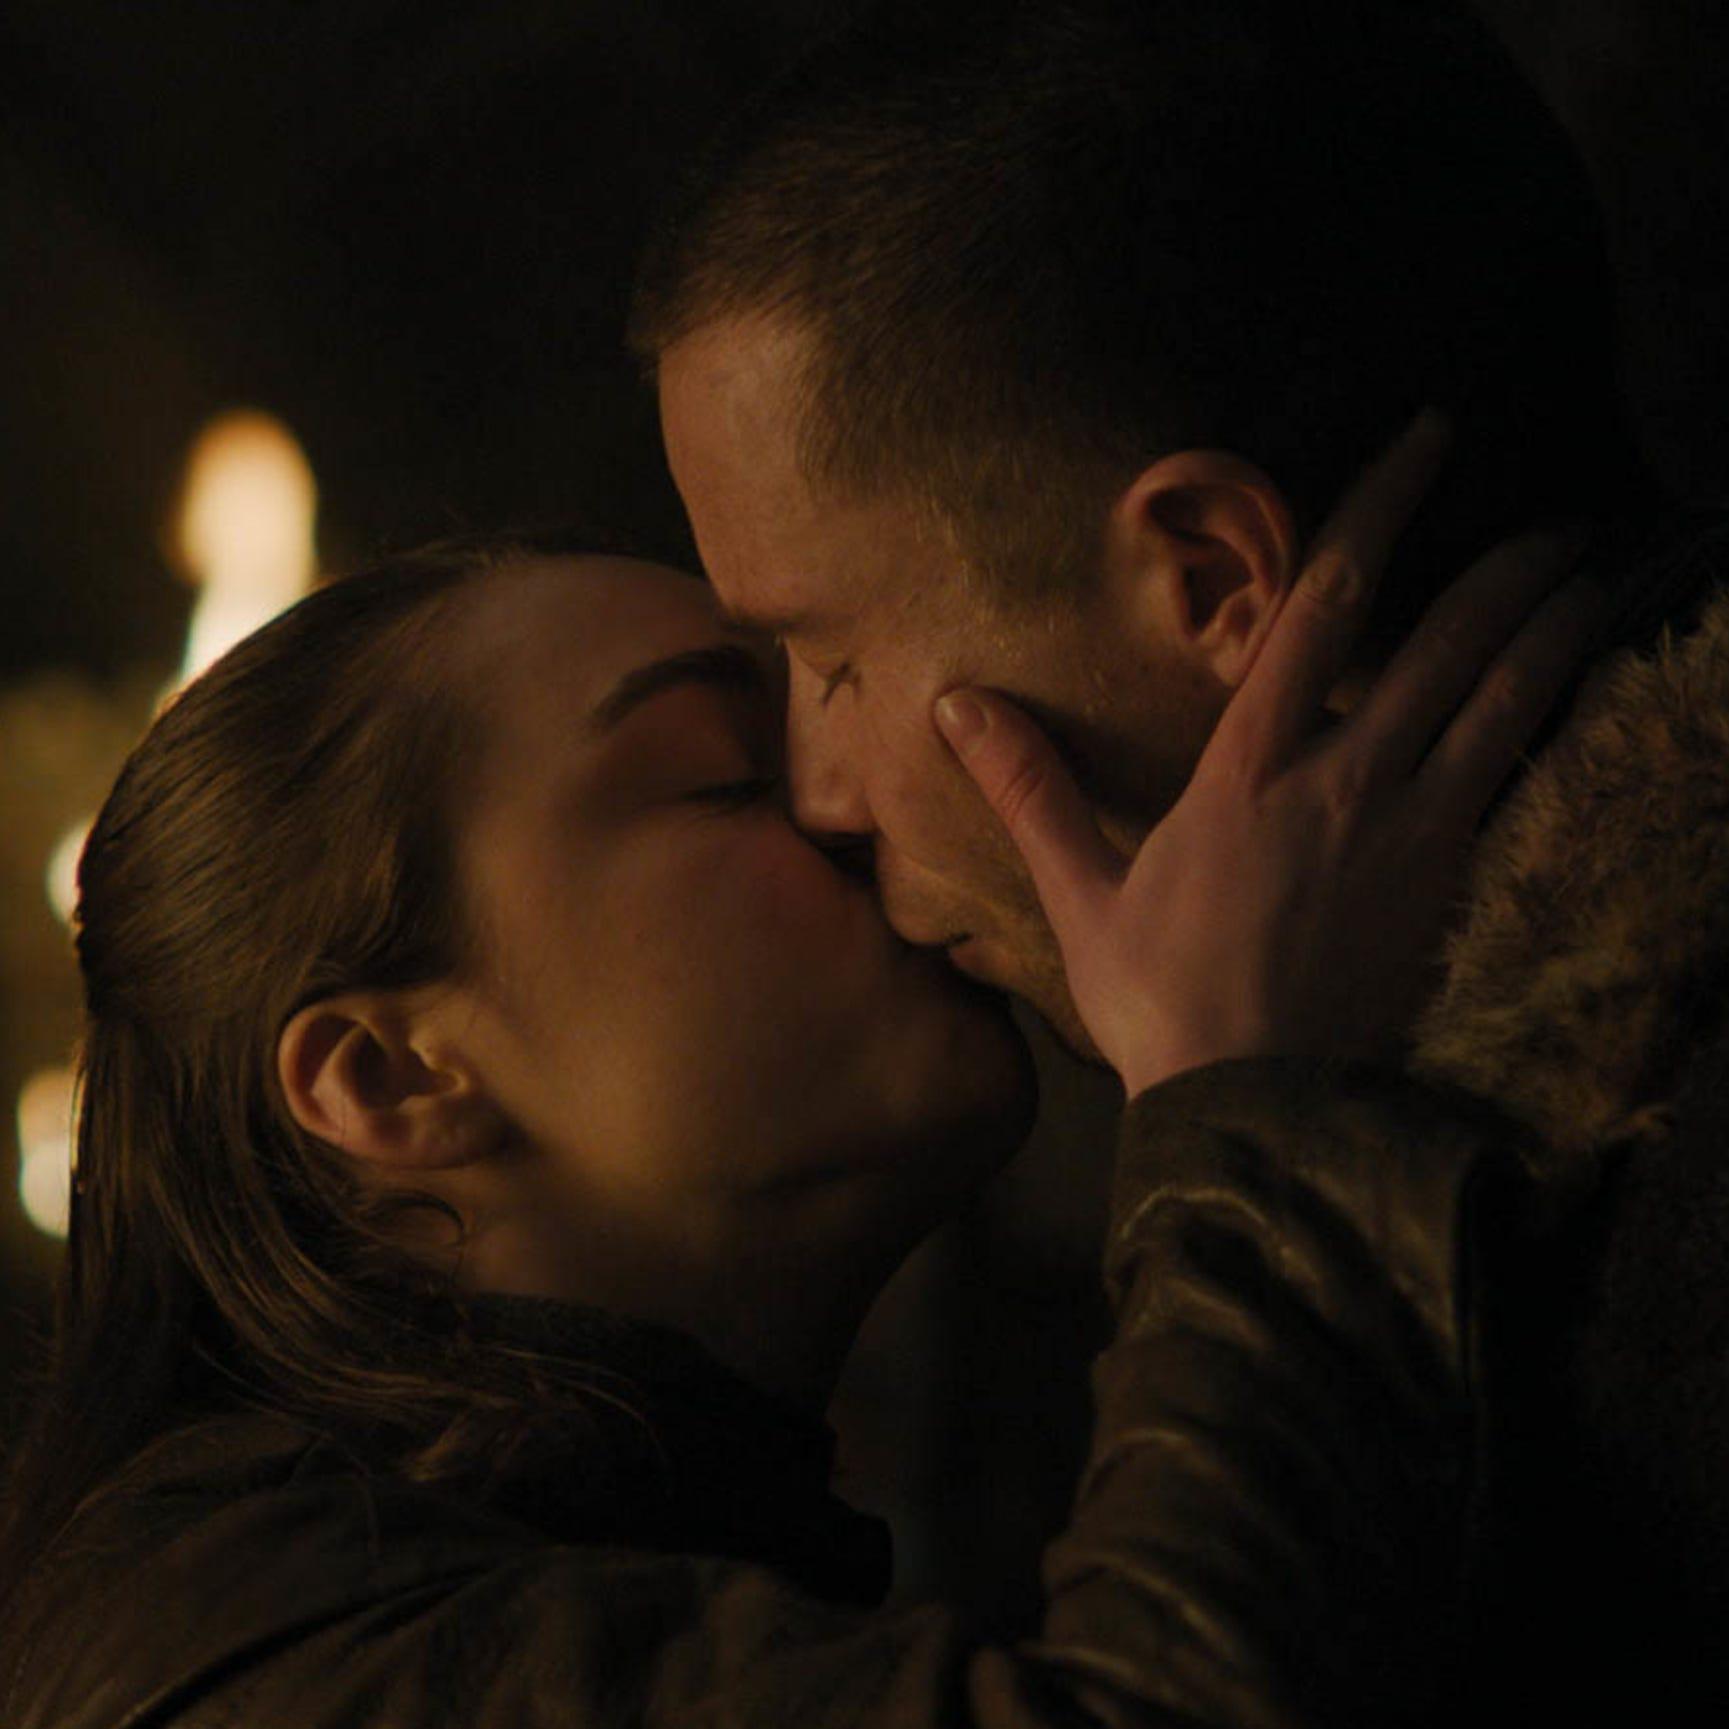 Maisie Williams as Arya Stark, left, and Joe Dempsie as Gendry on 'Game of Thrones.'